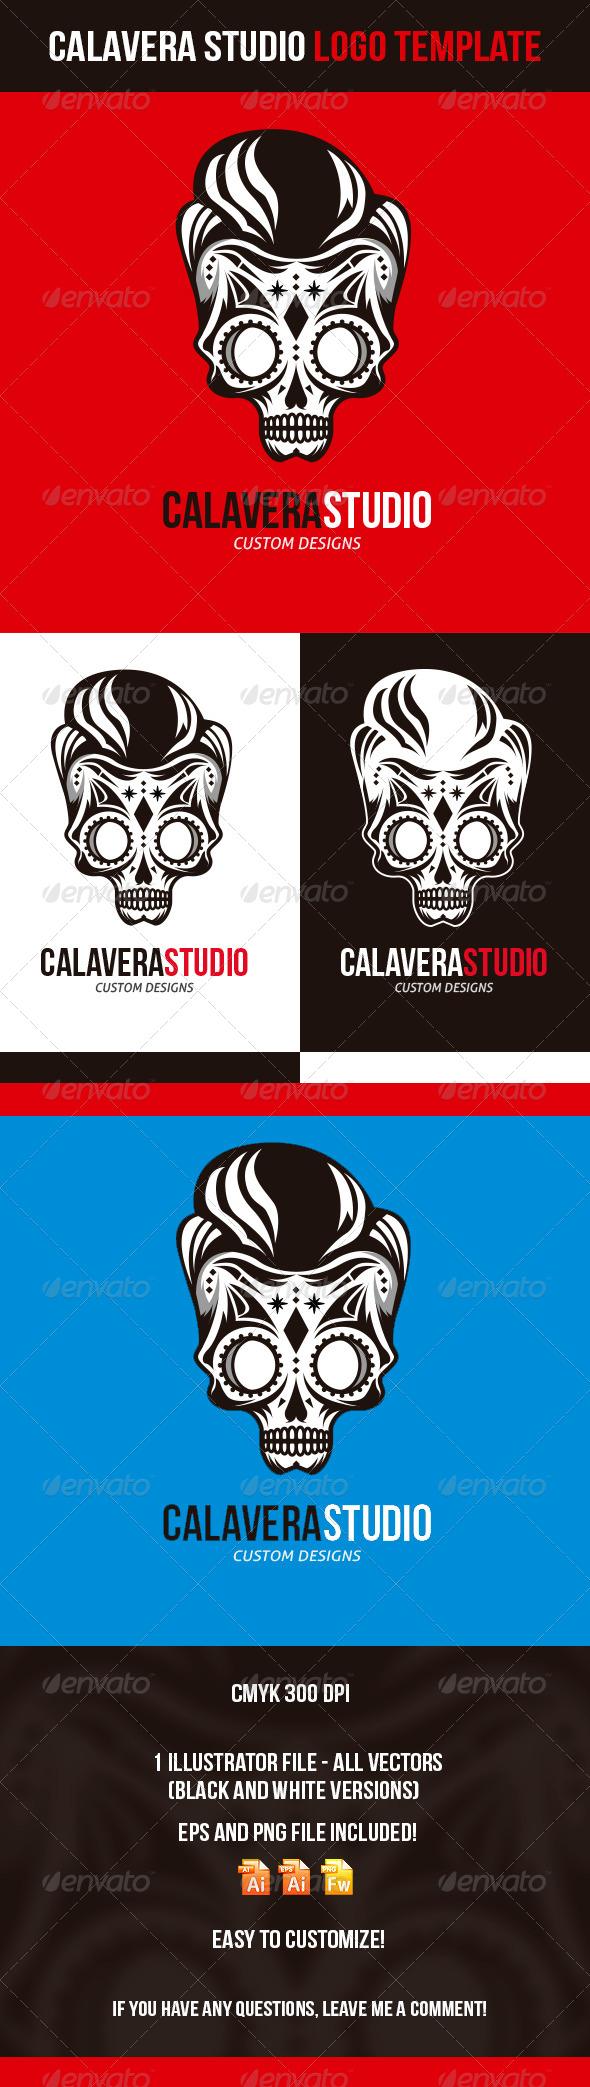 GraphicRiver Calavera Studio Logo Template 4485892